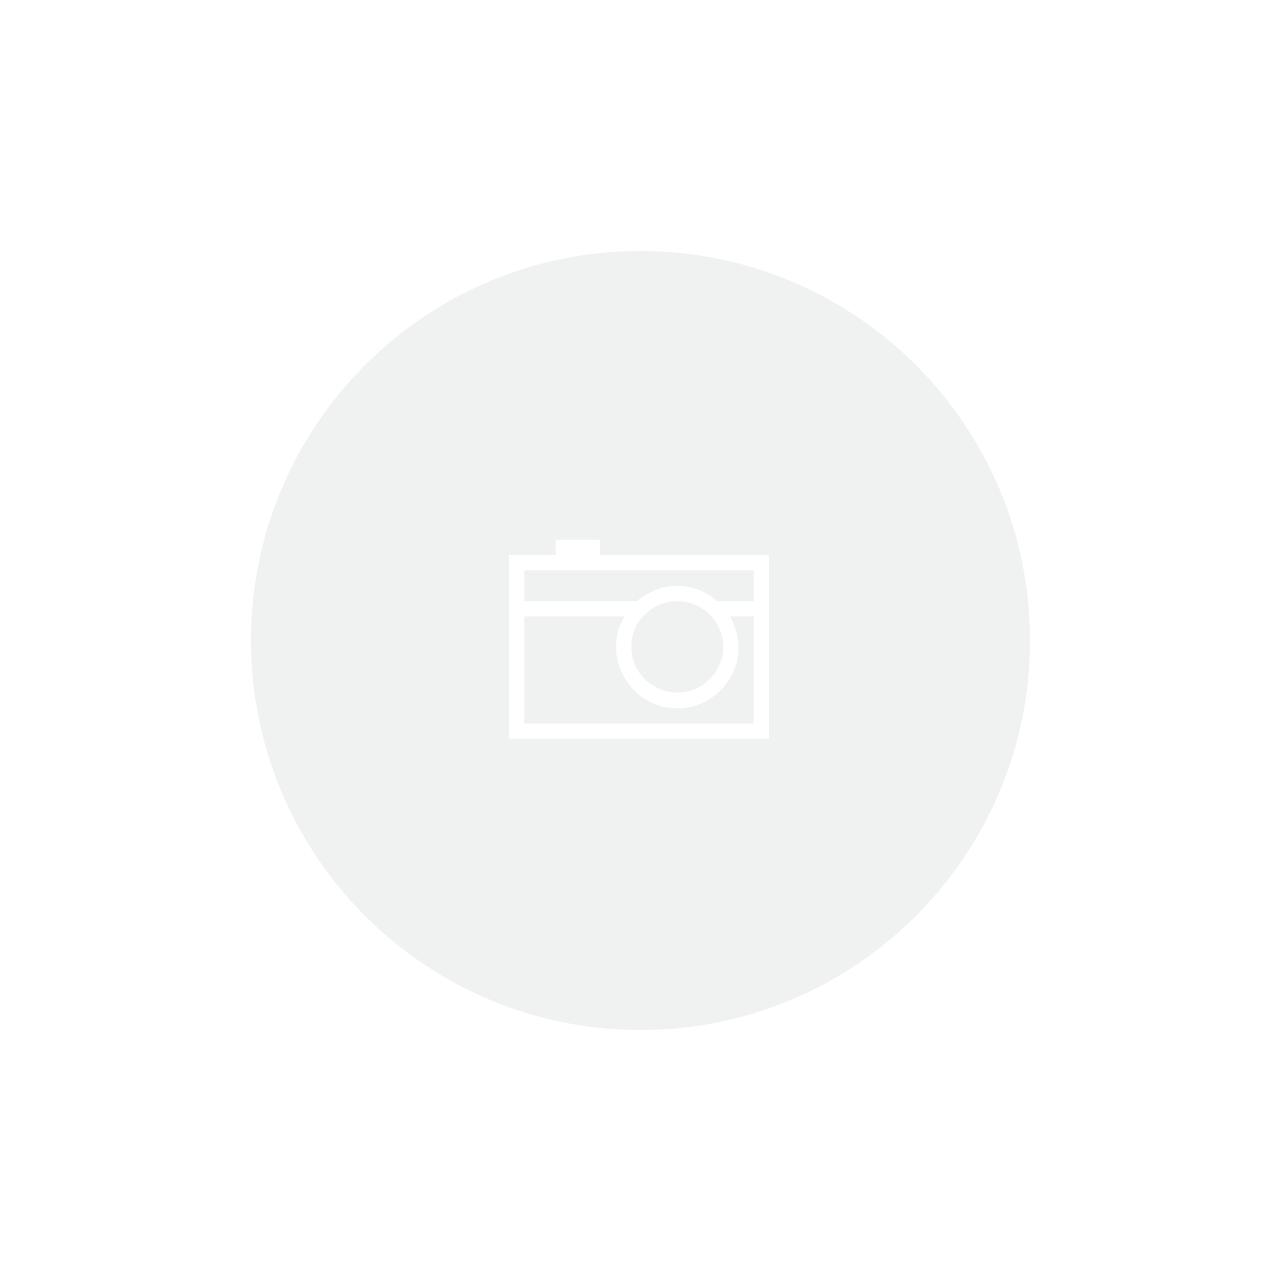 KIT TECLADO E MOUSE COOLER MASTER MASTERKEYS LITE L RGB - SGB-3040-KKMF1-BR